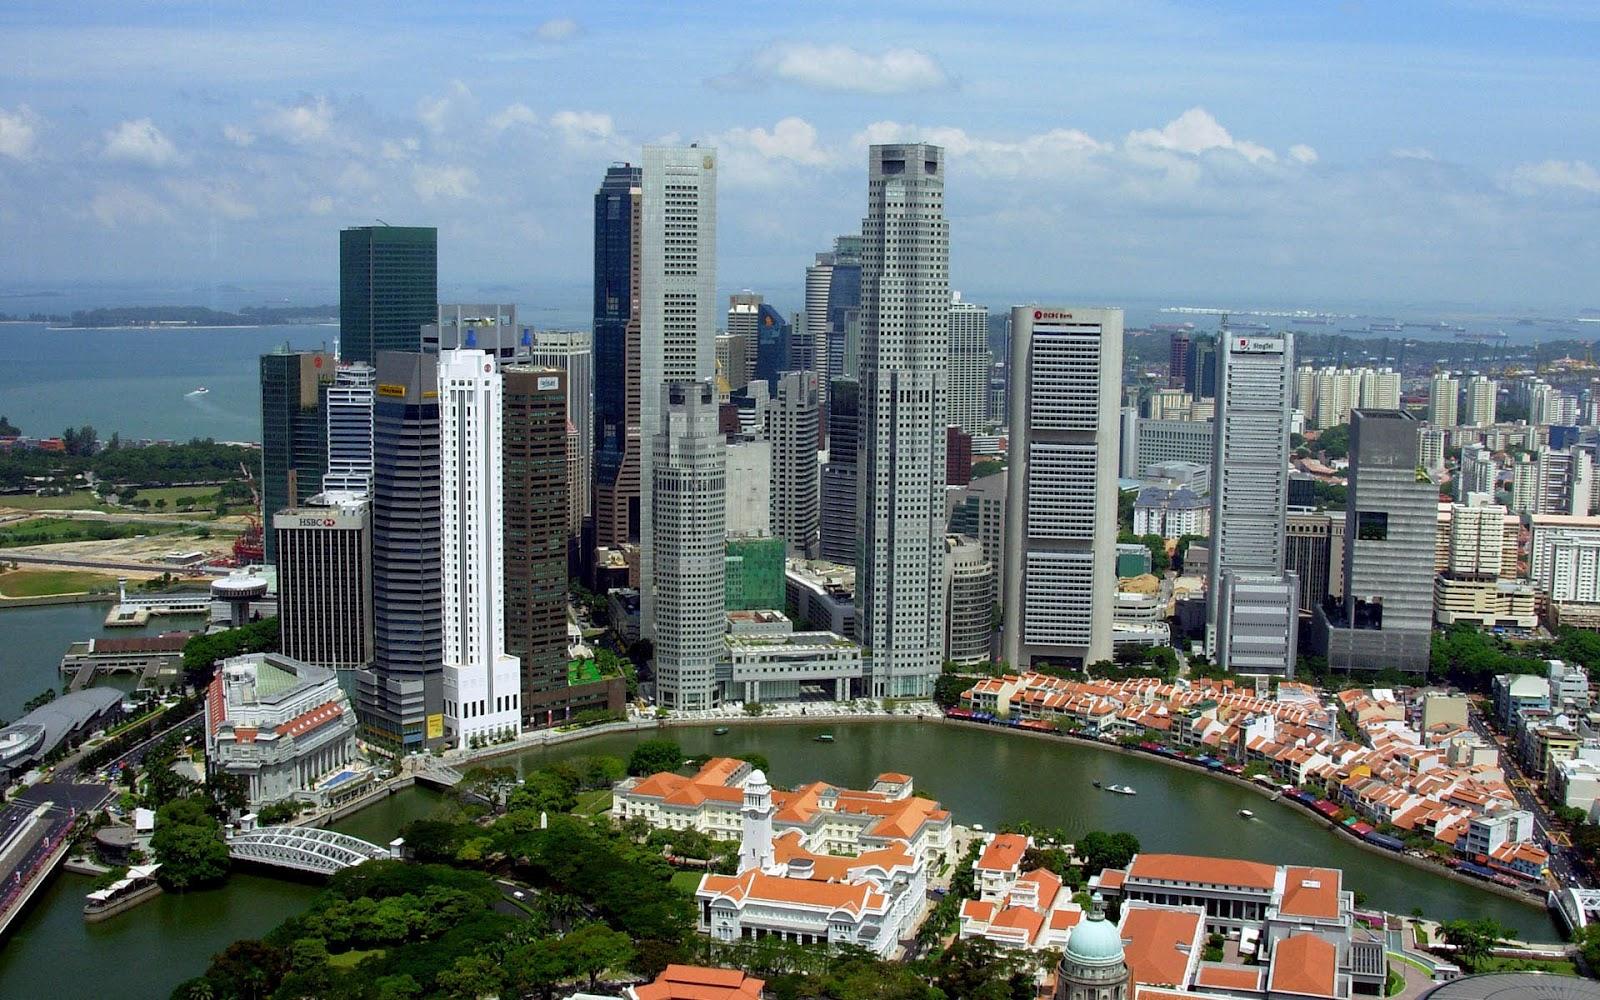 http://4.bp.blogspot.com/-olrhrVsRblE/T3krqHXrVoI/AAAAAAAAGBU/zchPQ3XBGVg/s1600/Singapore%2BSkyline%2BHd%2BWallpaper%2B(13).jpg